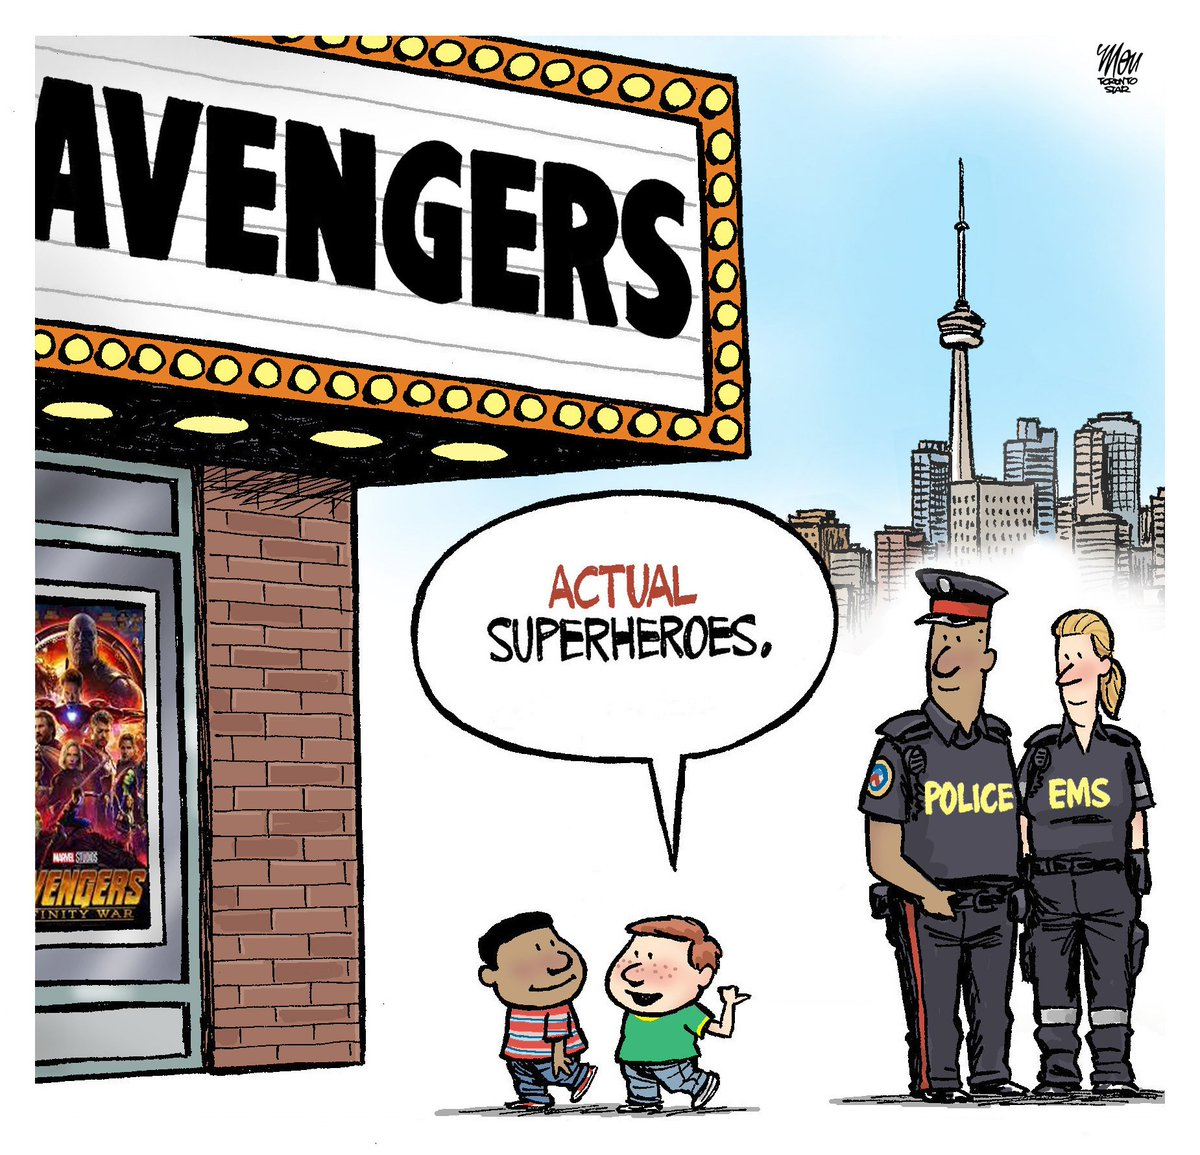 Here's today's #TorontoStrong cartoon in @TorontoStar